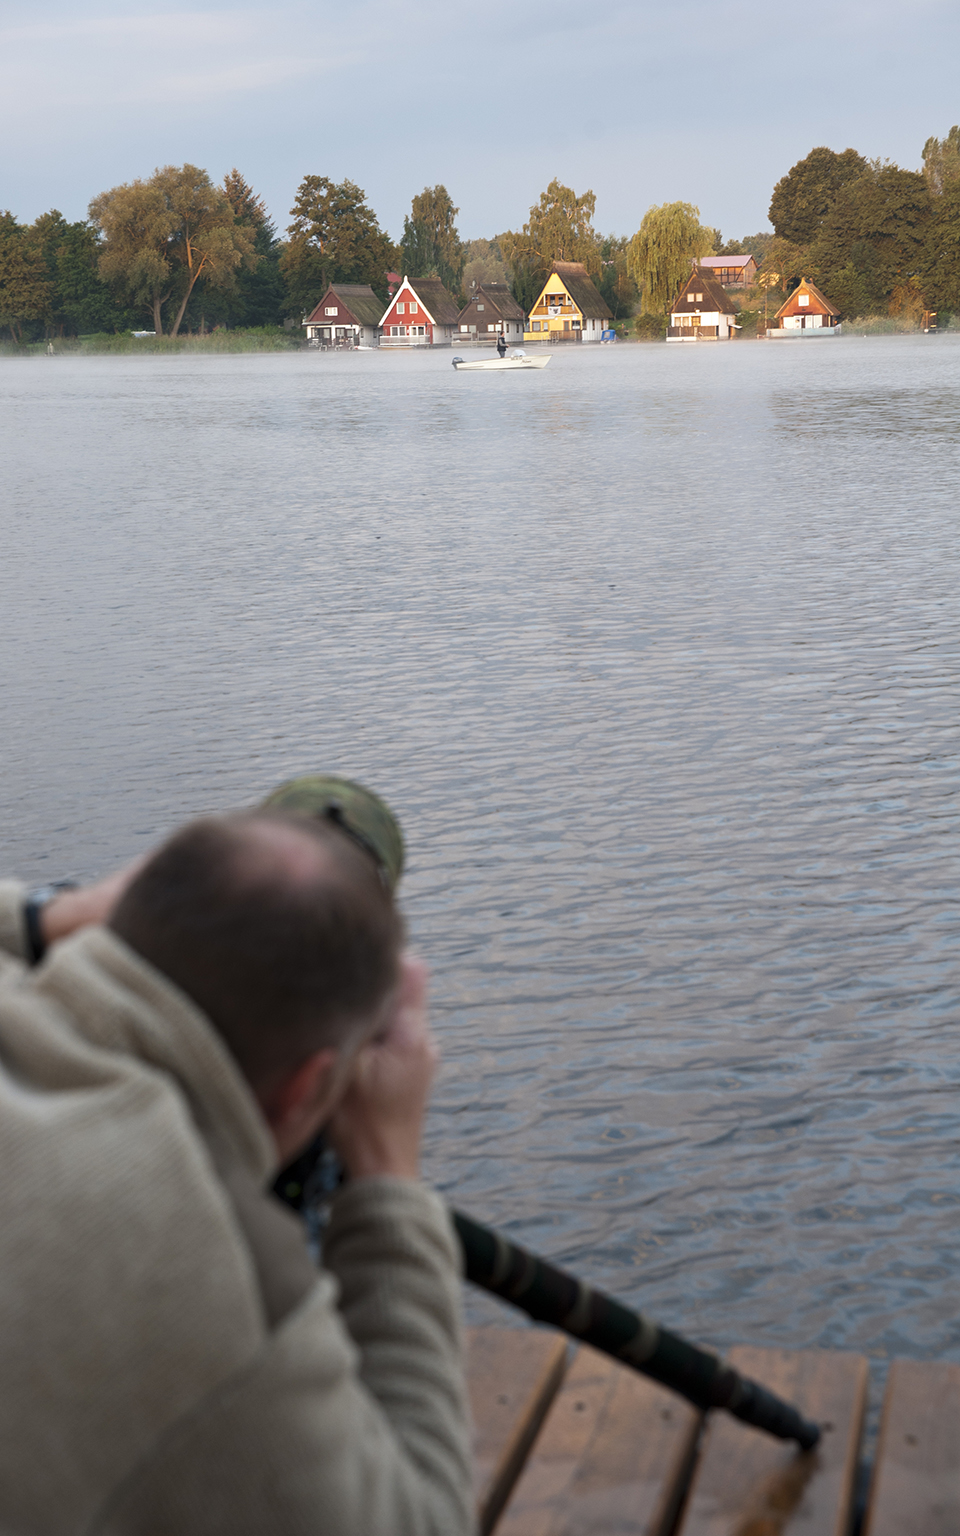 Angler vor den Mirower Bootshäusern, Mecklenburgische Seenplatte